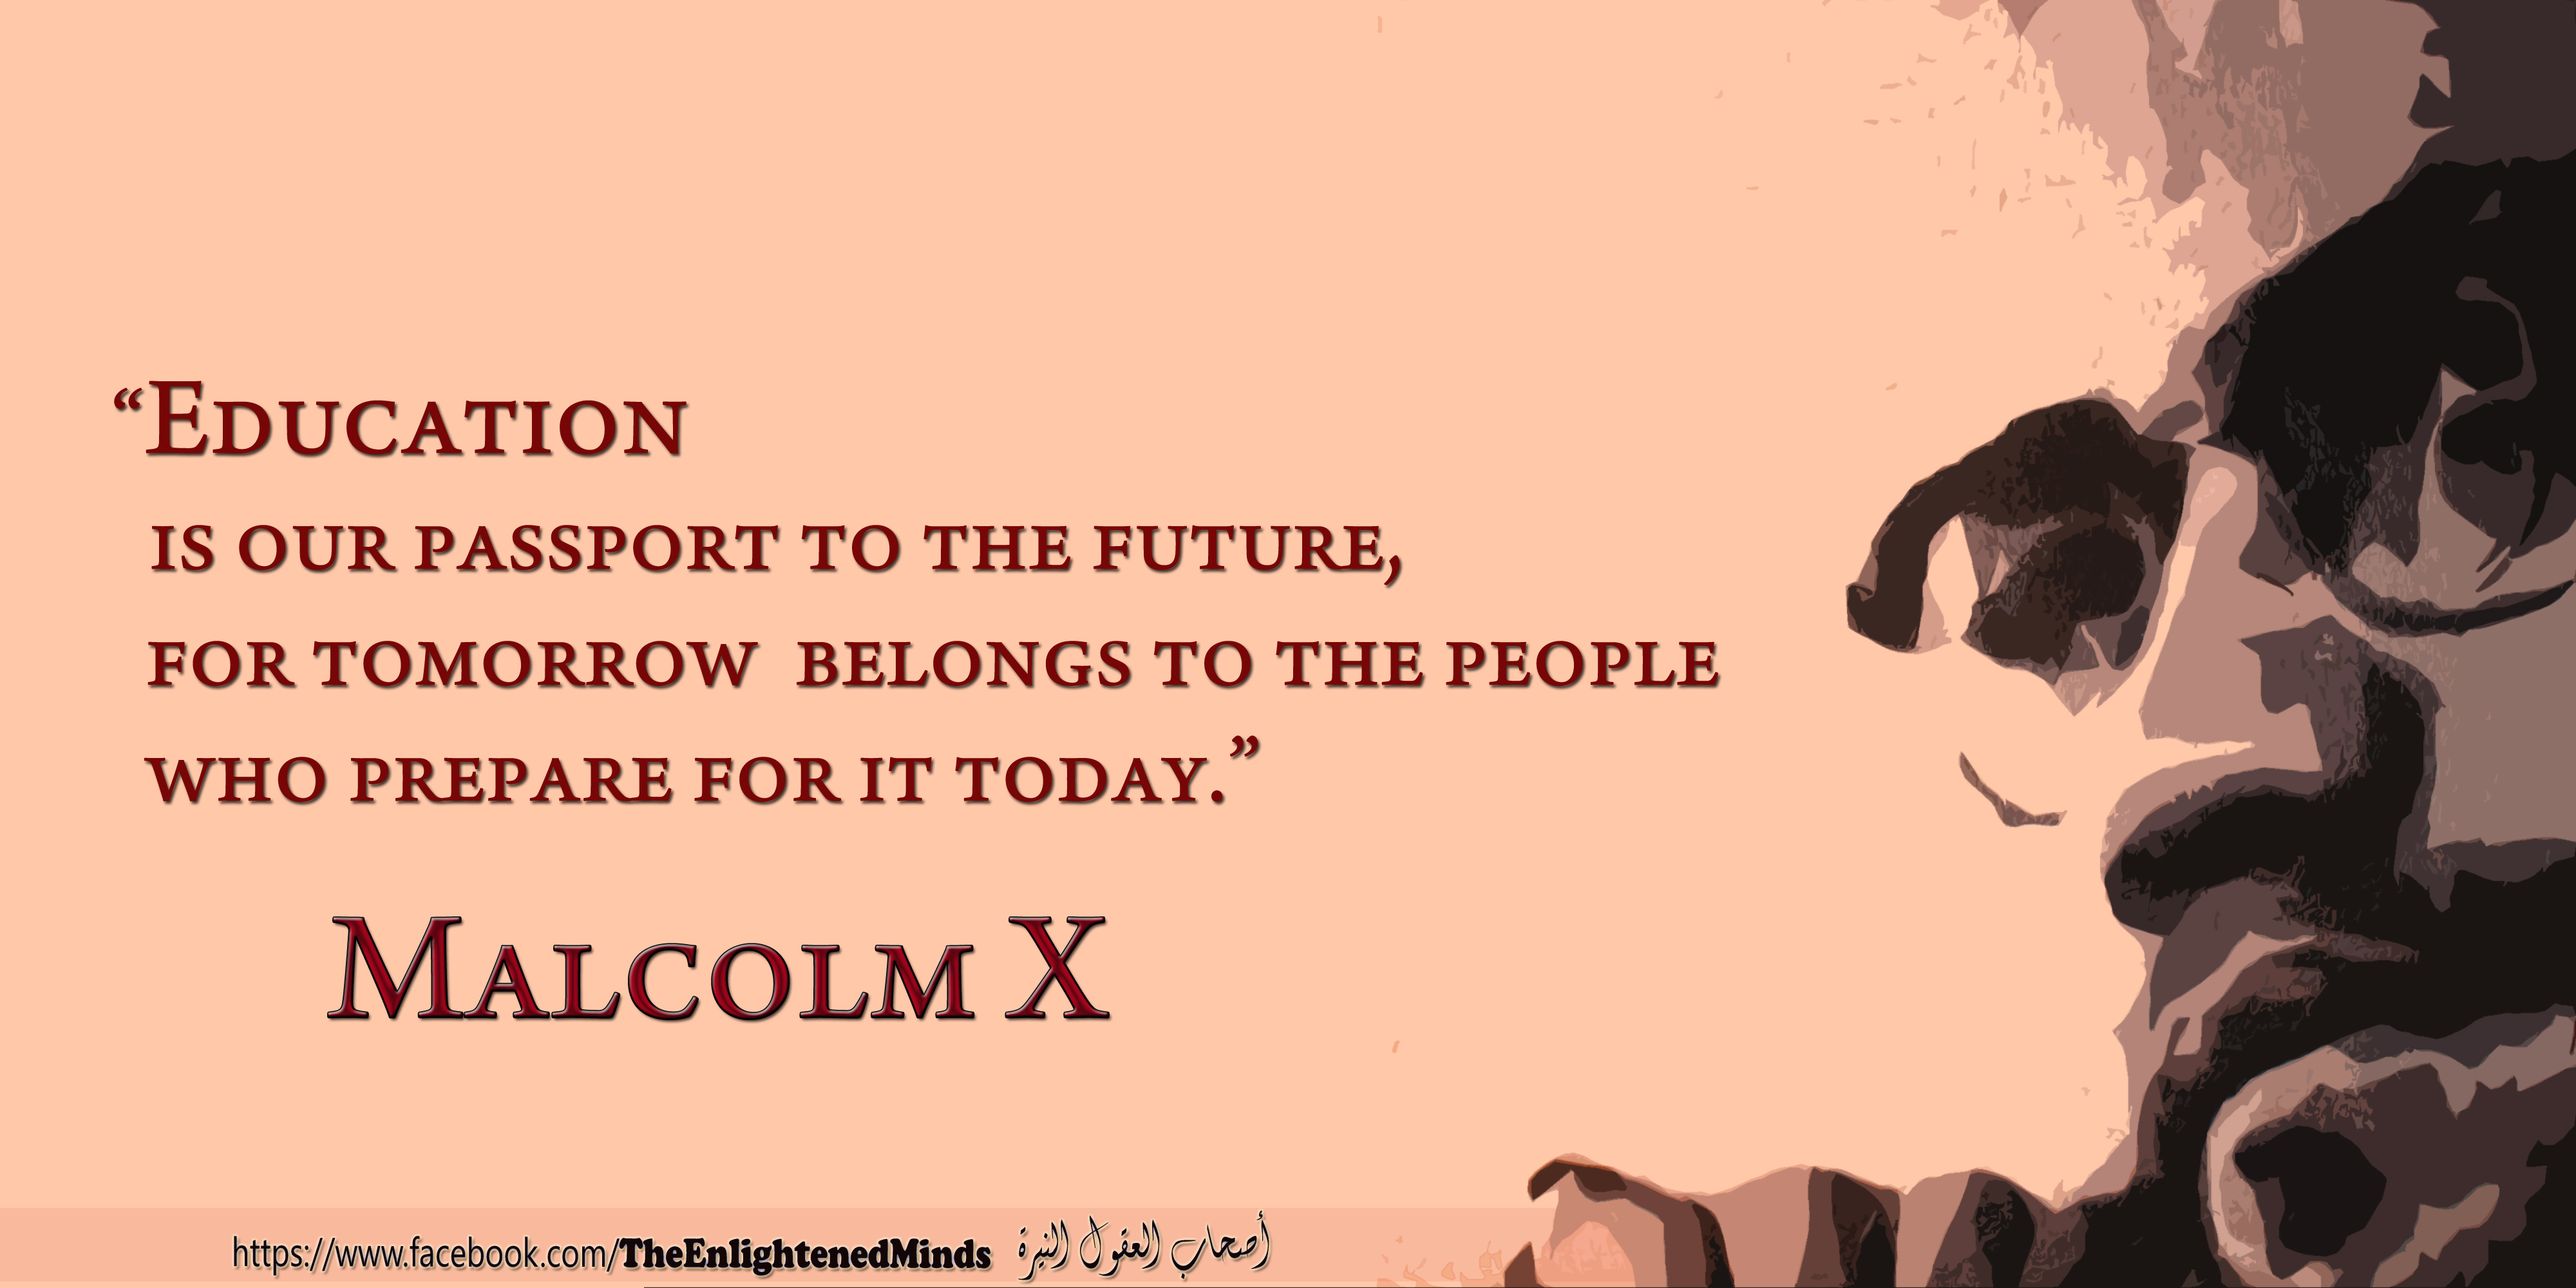 Malcolm quote #1